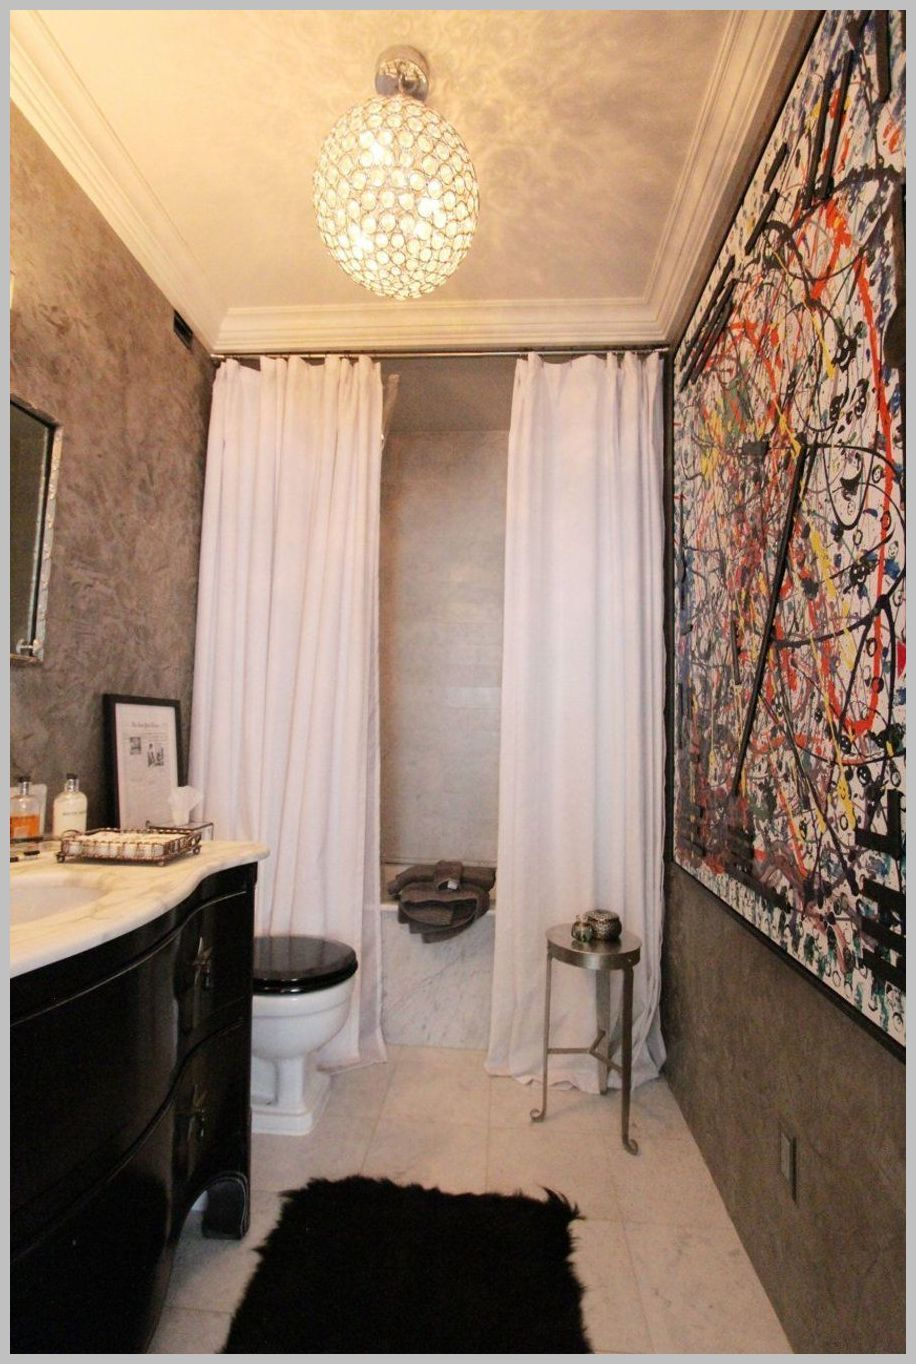 Cheap Elegant Bathroom Sink Faucet: [ Bathroom Decorating Ideas ] How To Make Your Bathroom